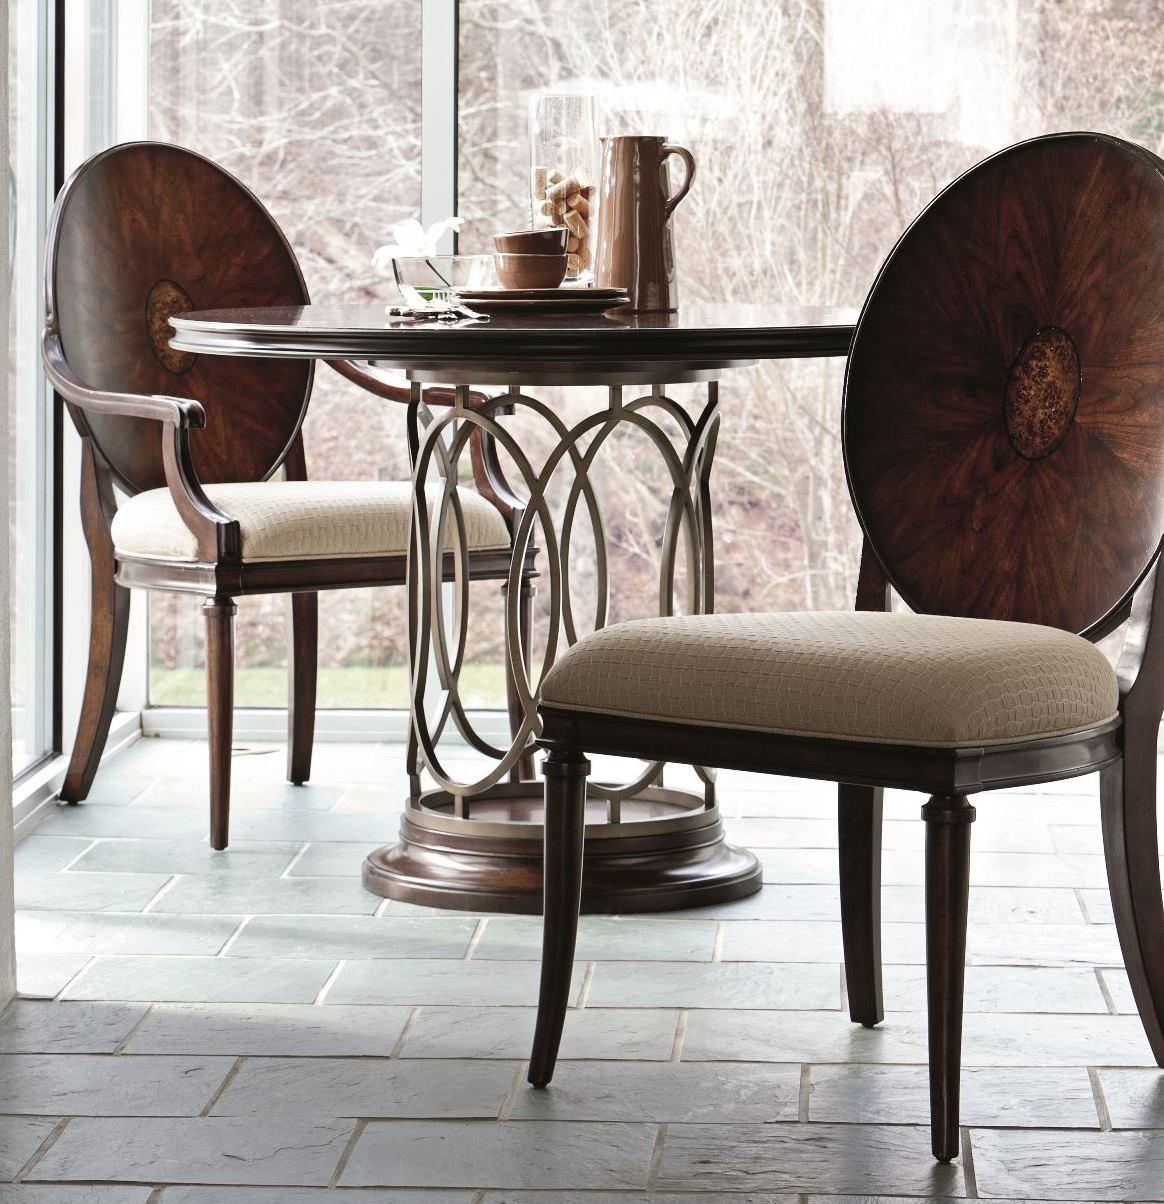 pedestal dining room set from stanley 193 11 30 coleman furniture